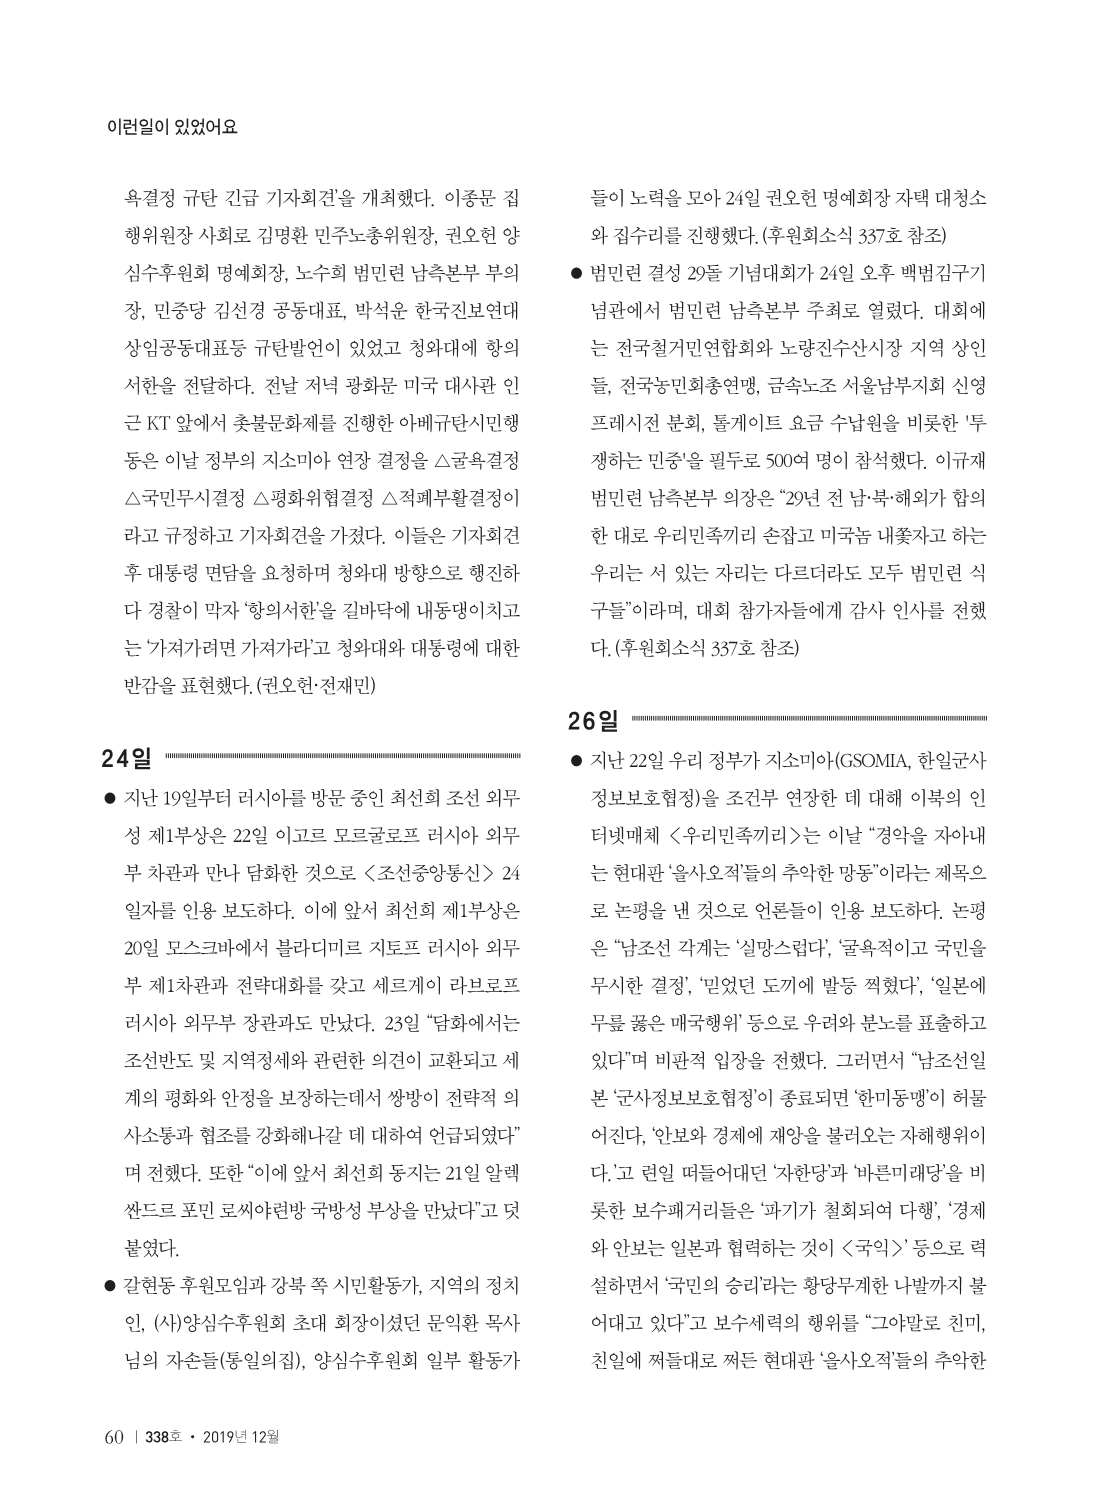 5802db1f-6a90-451c-ac2e-da2a23bee939.pdf-0062.jpg